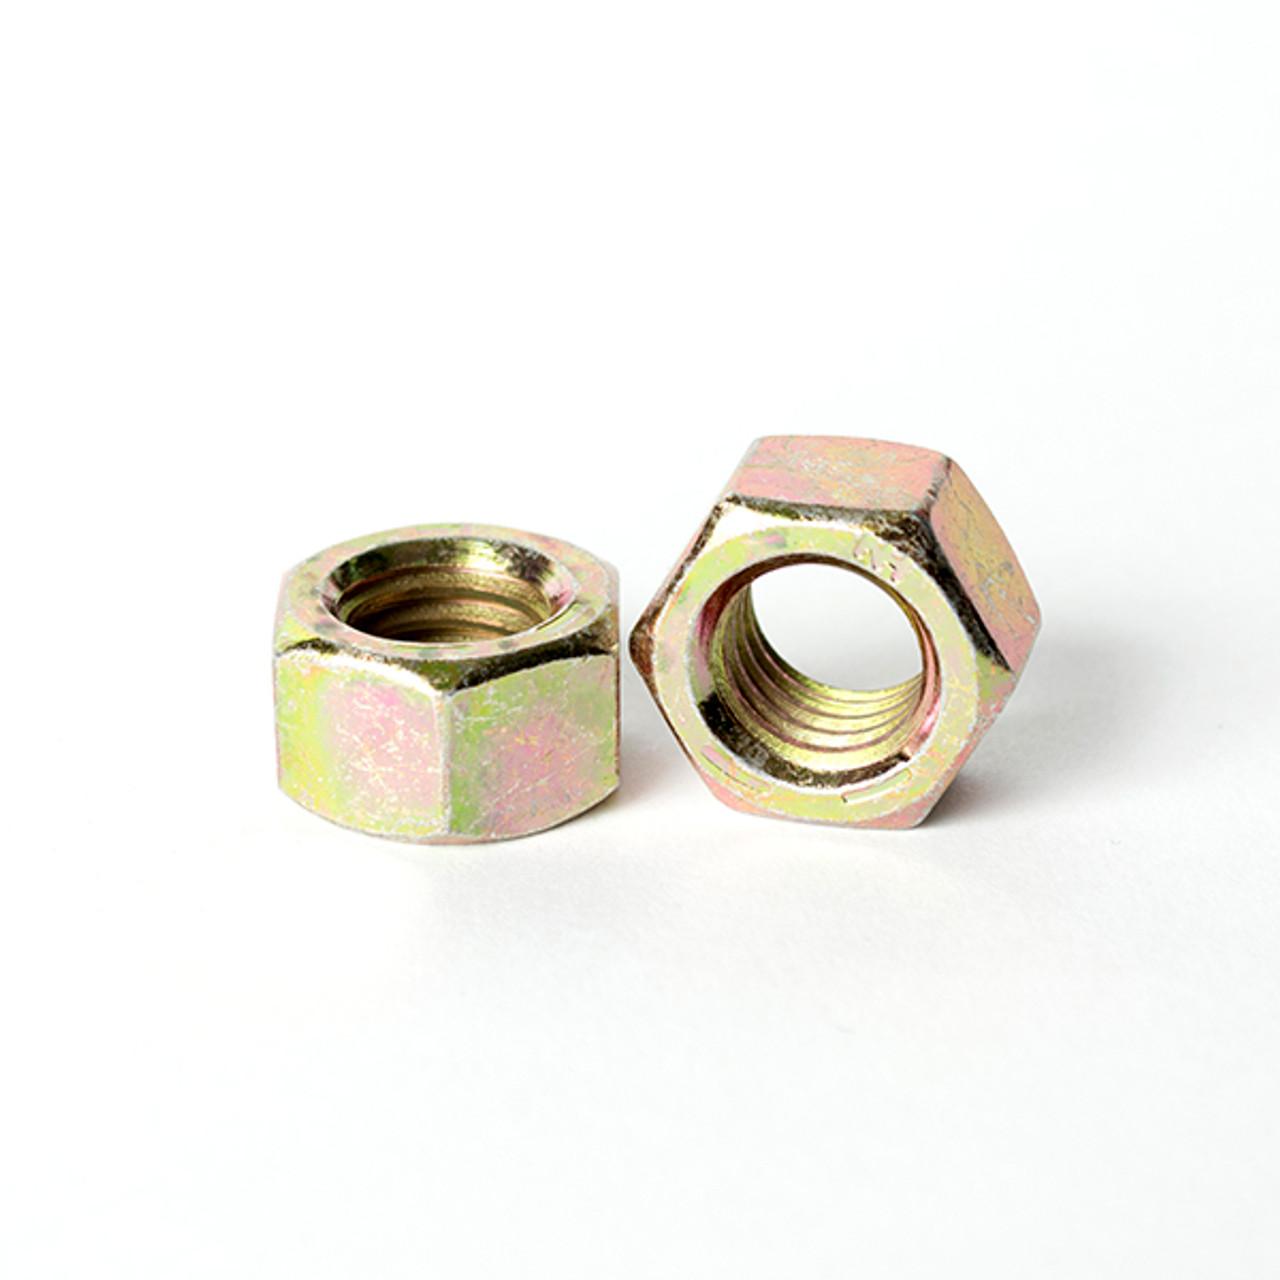 Business & Industrial Hex Nuts simetriaoptica.com 3/8-16 HEX NUT ...